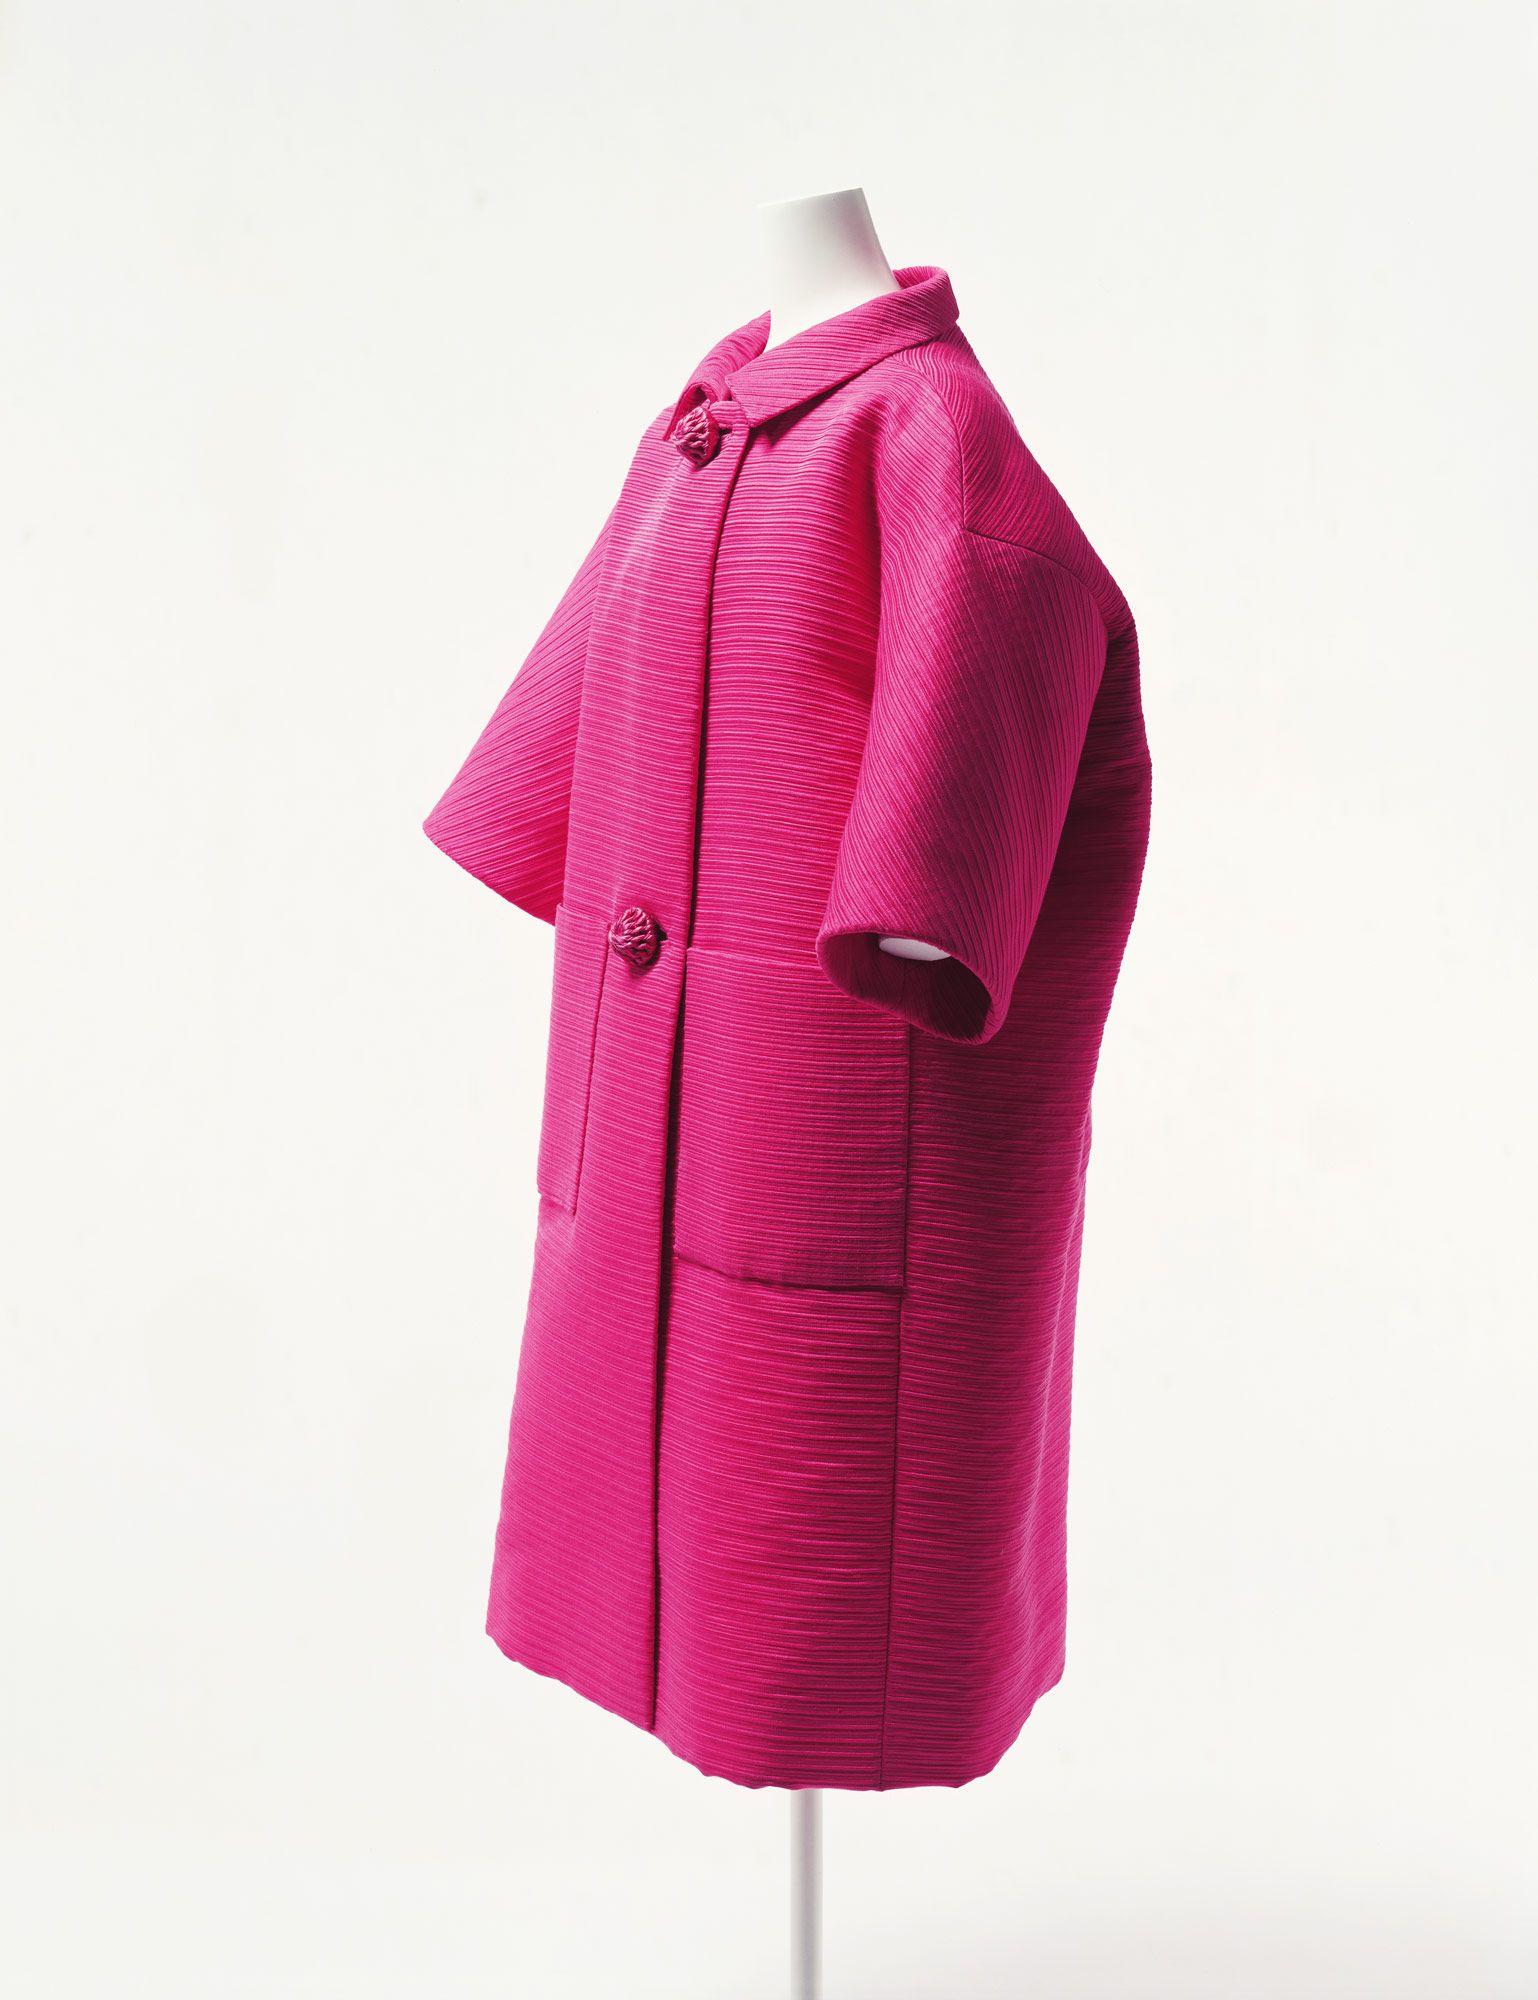 Coat1,955 Designer: Cristobal Balenciaga Brand: Balenciaga Label: BALENCIAGA 10, AVENUE GEORGE V PARIS Material: Fuchsia silk ottoman woven with striped pattern; cord-wrapped buttons.